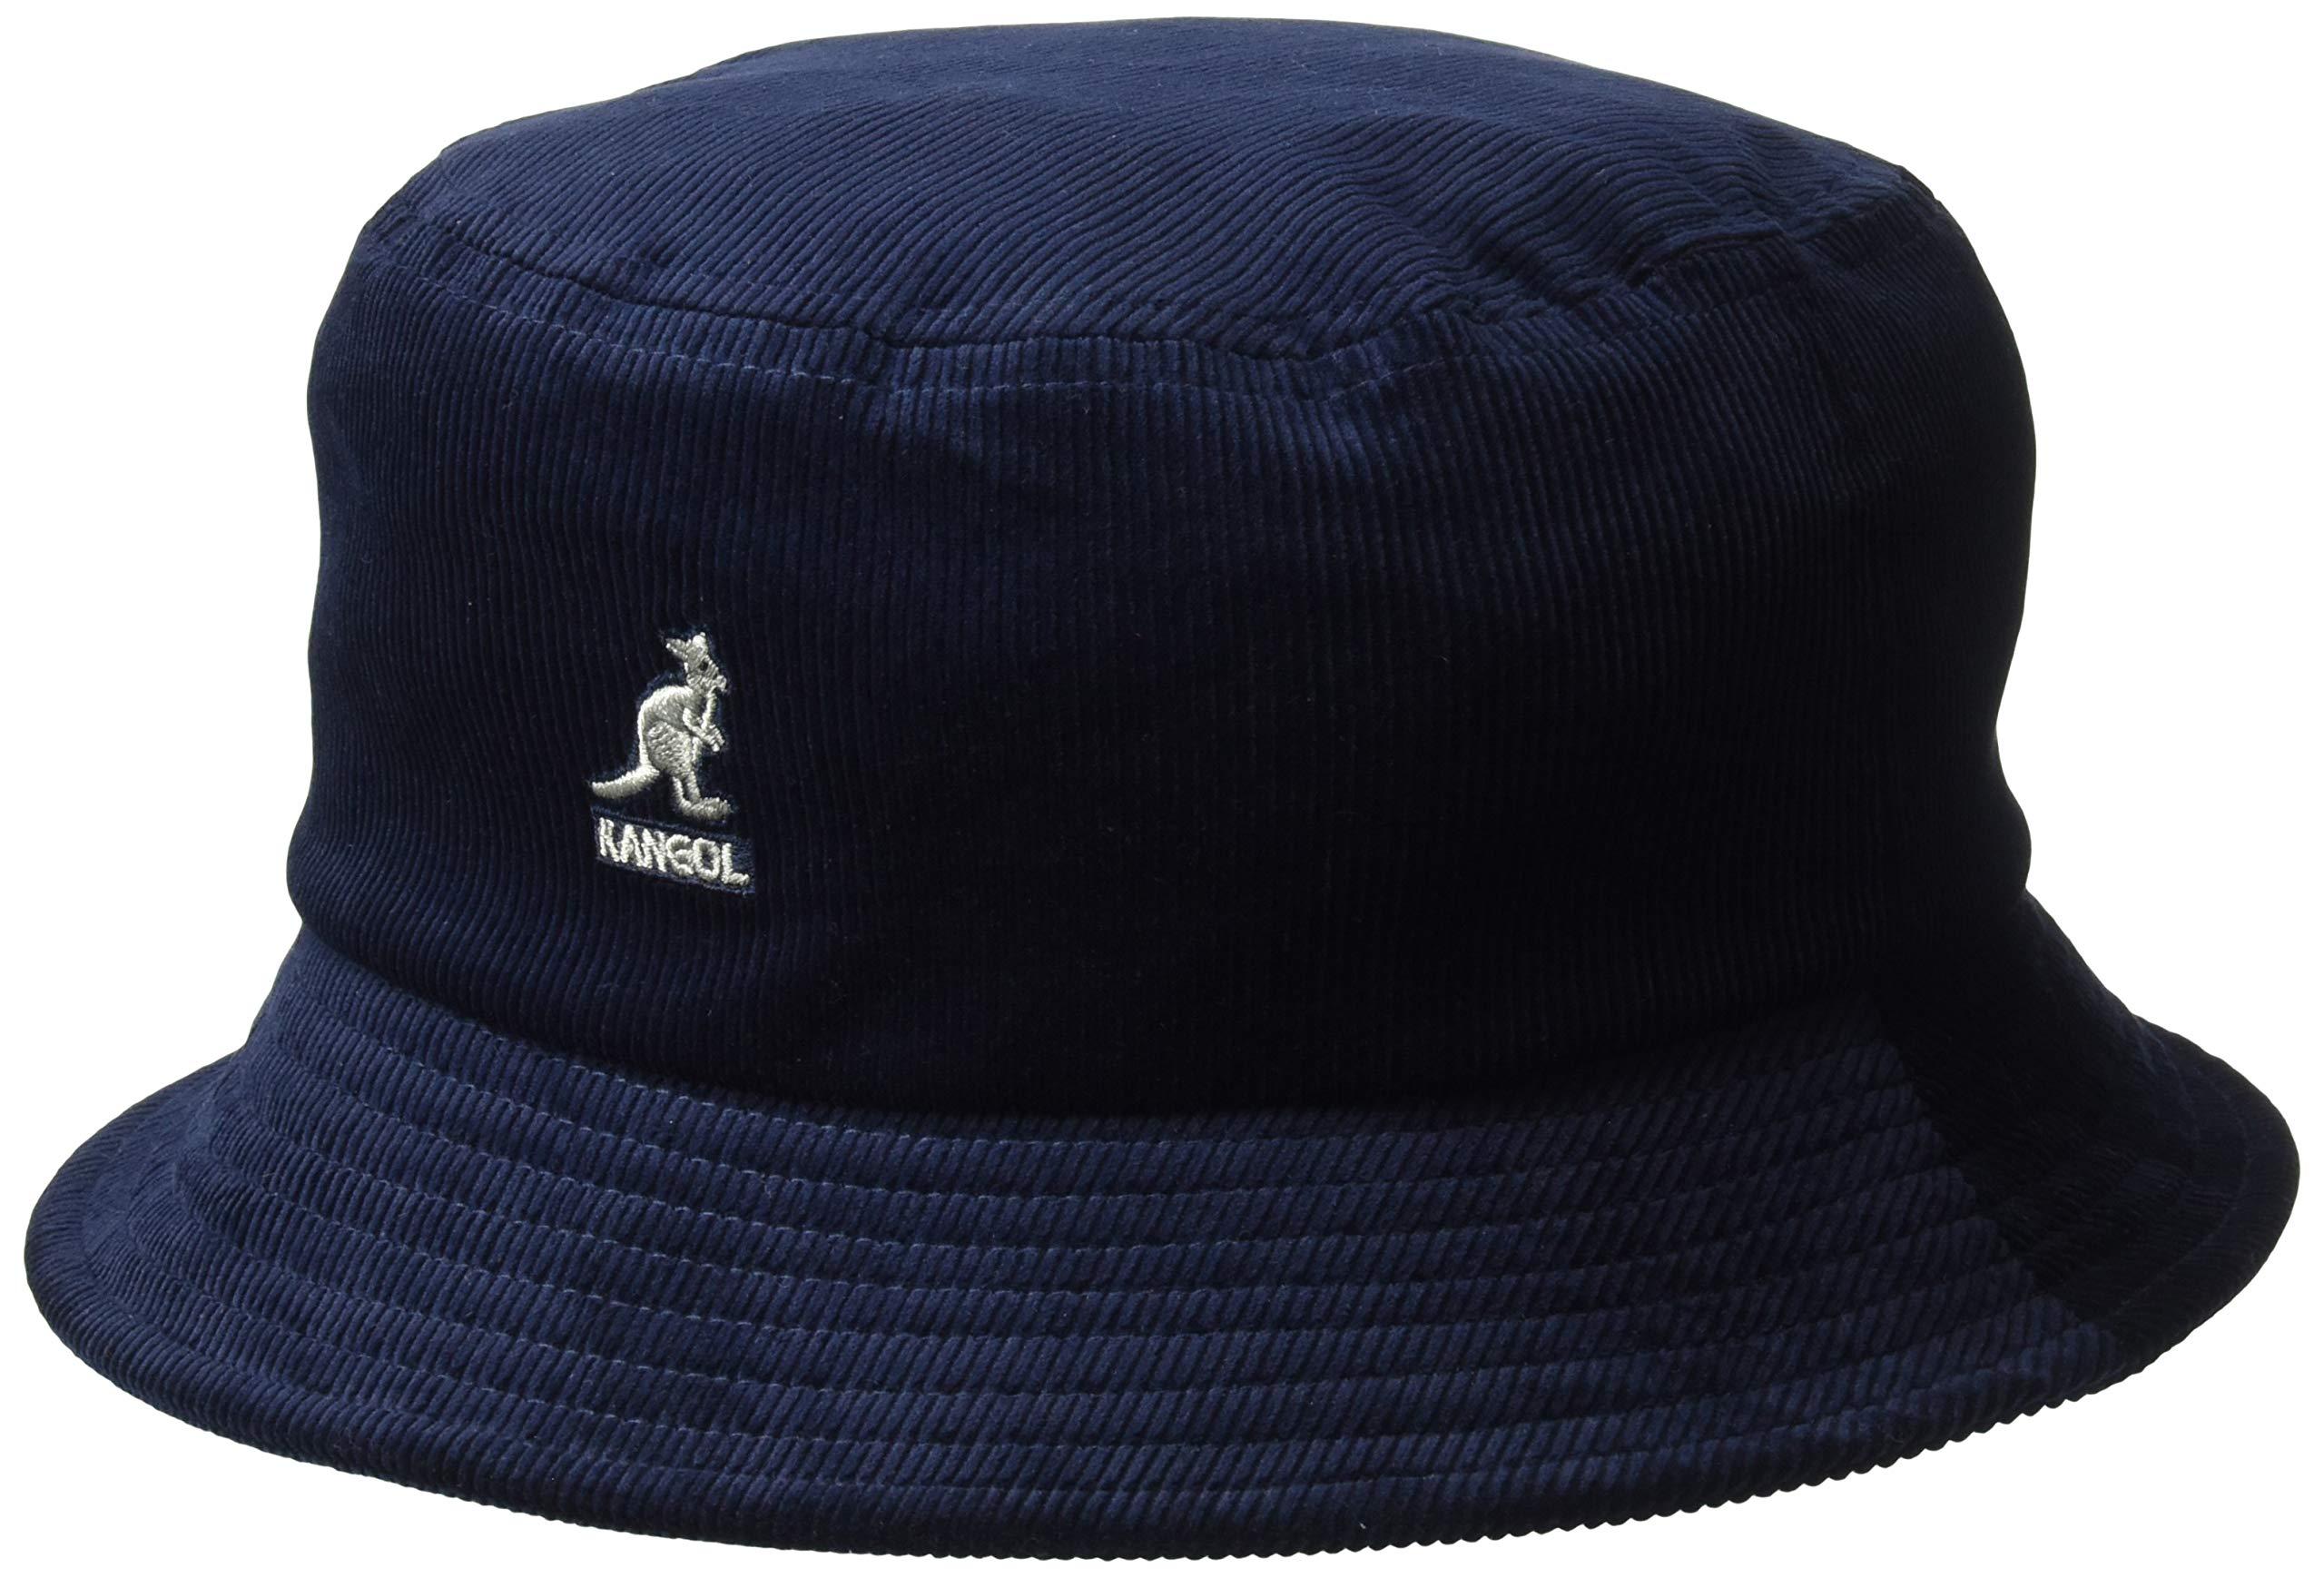 Kangol Men's Cord Bucket HAT, Navy, S